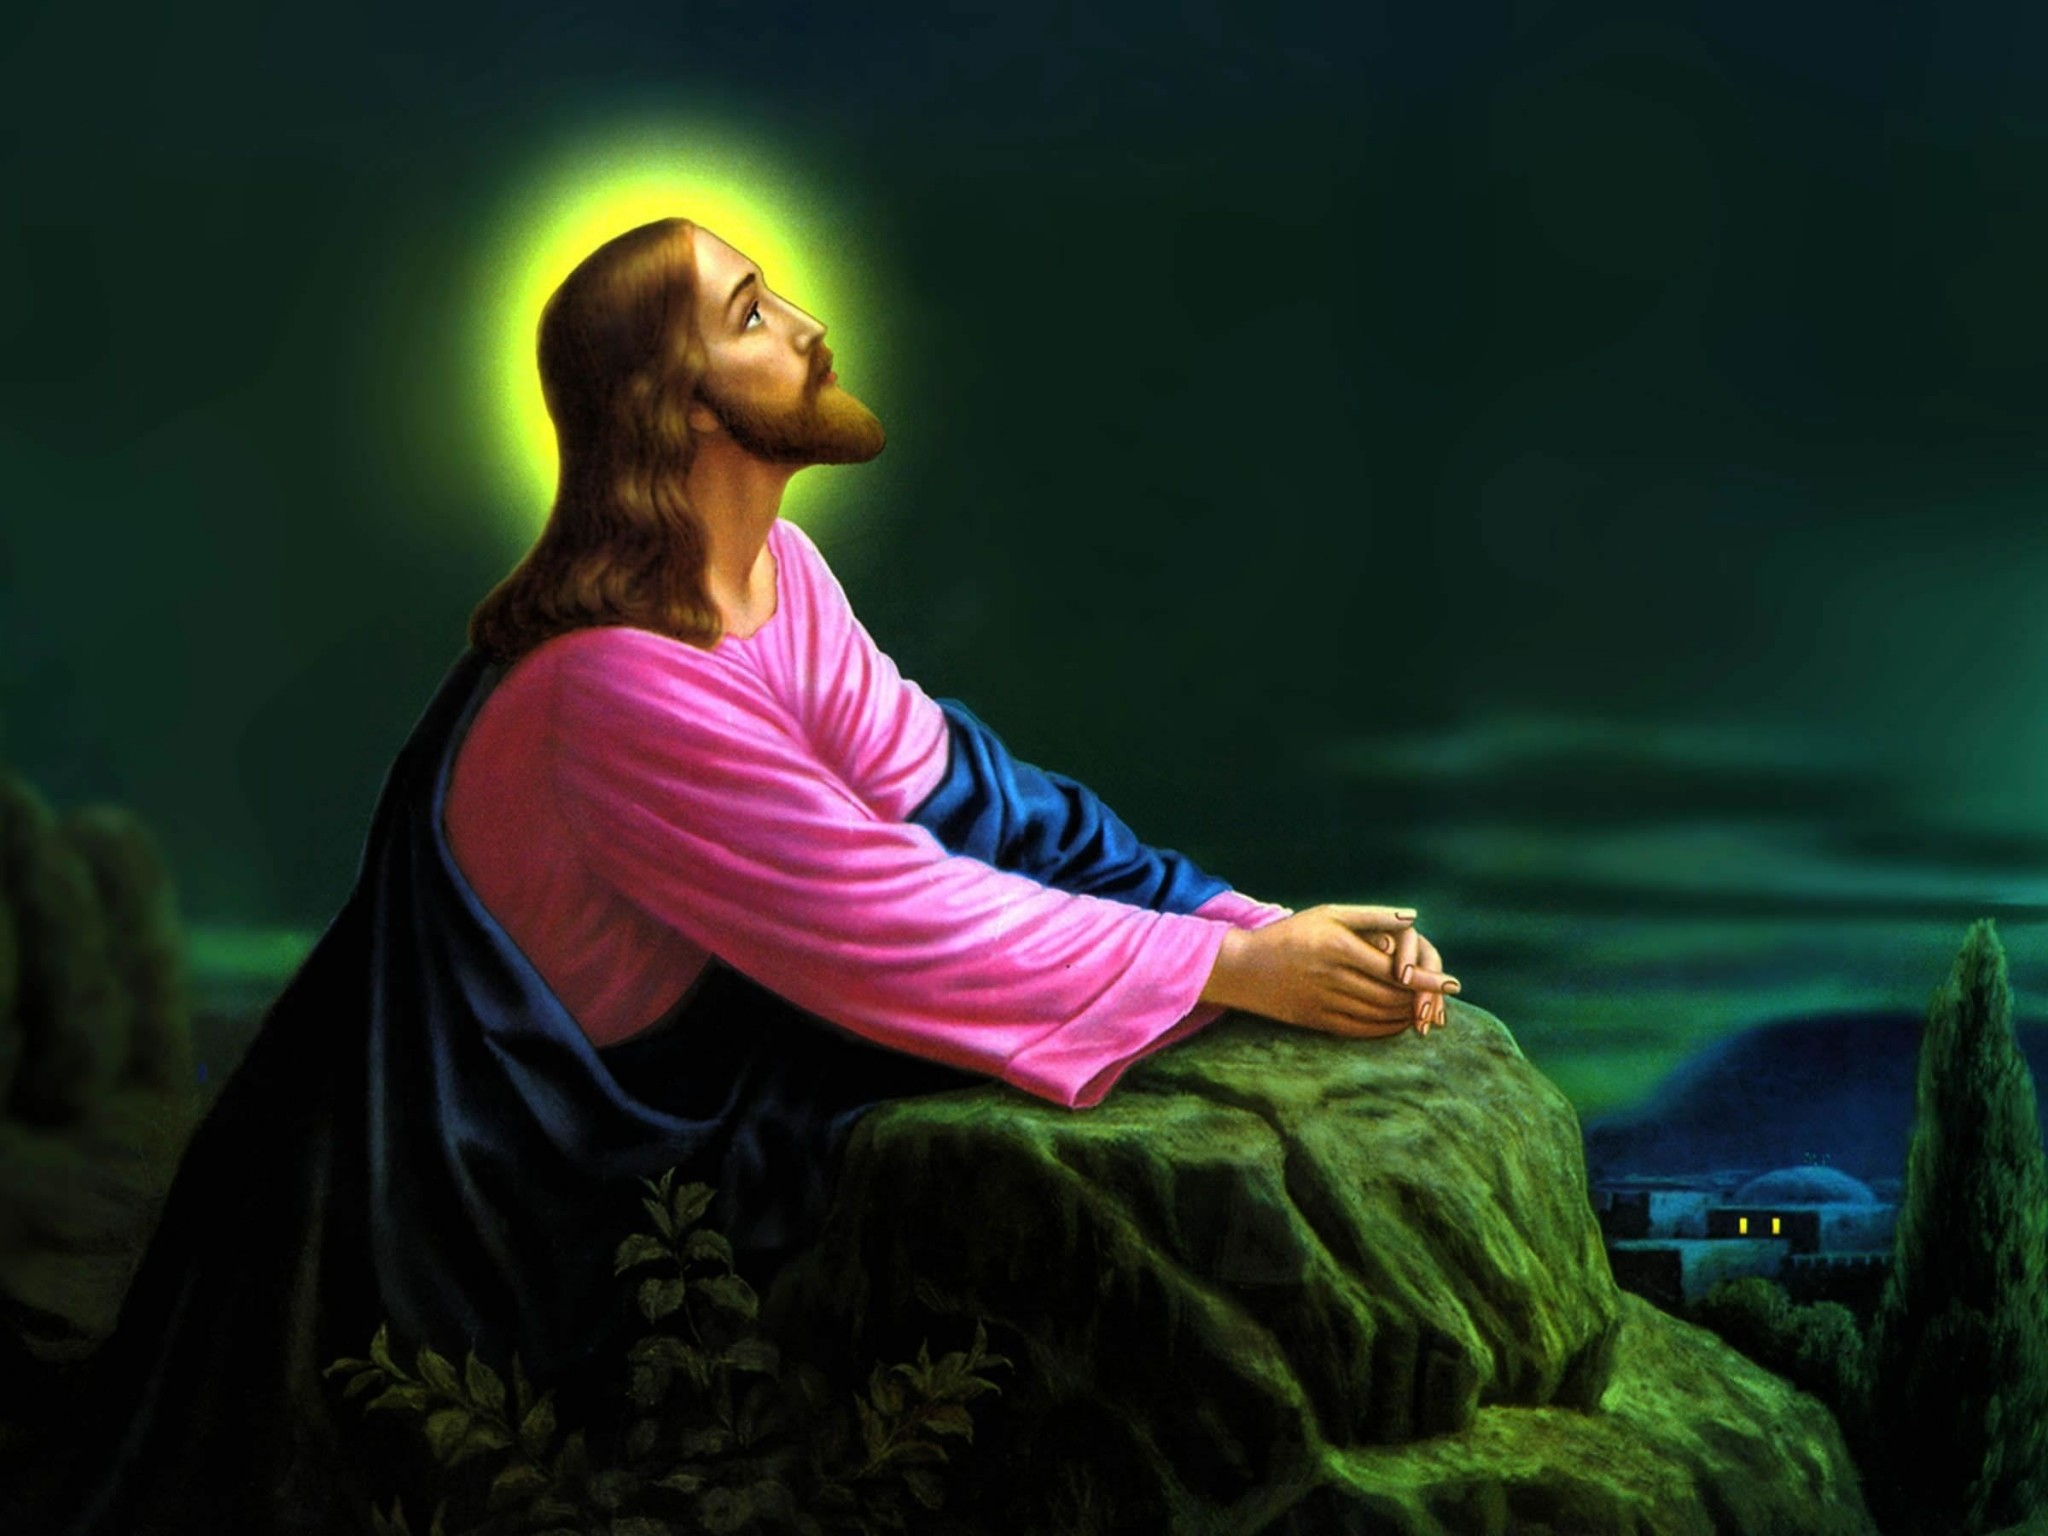 Beautiful Pictures Of Jesus Wallpaper Wallpapertag